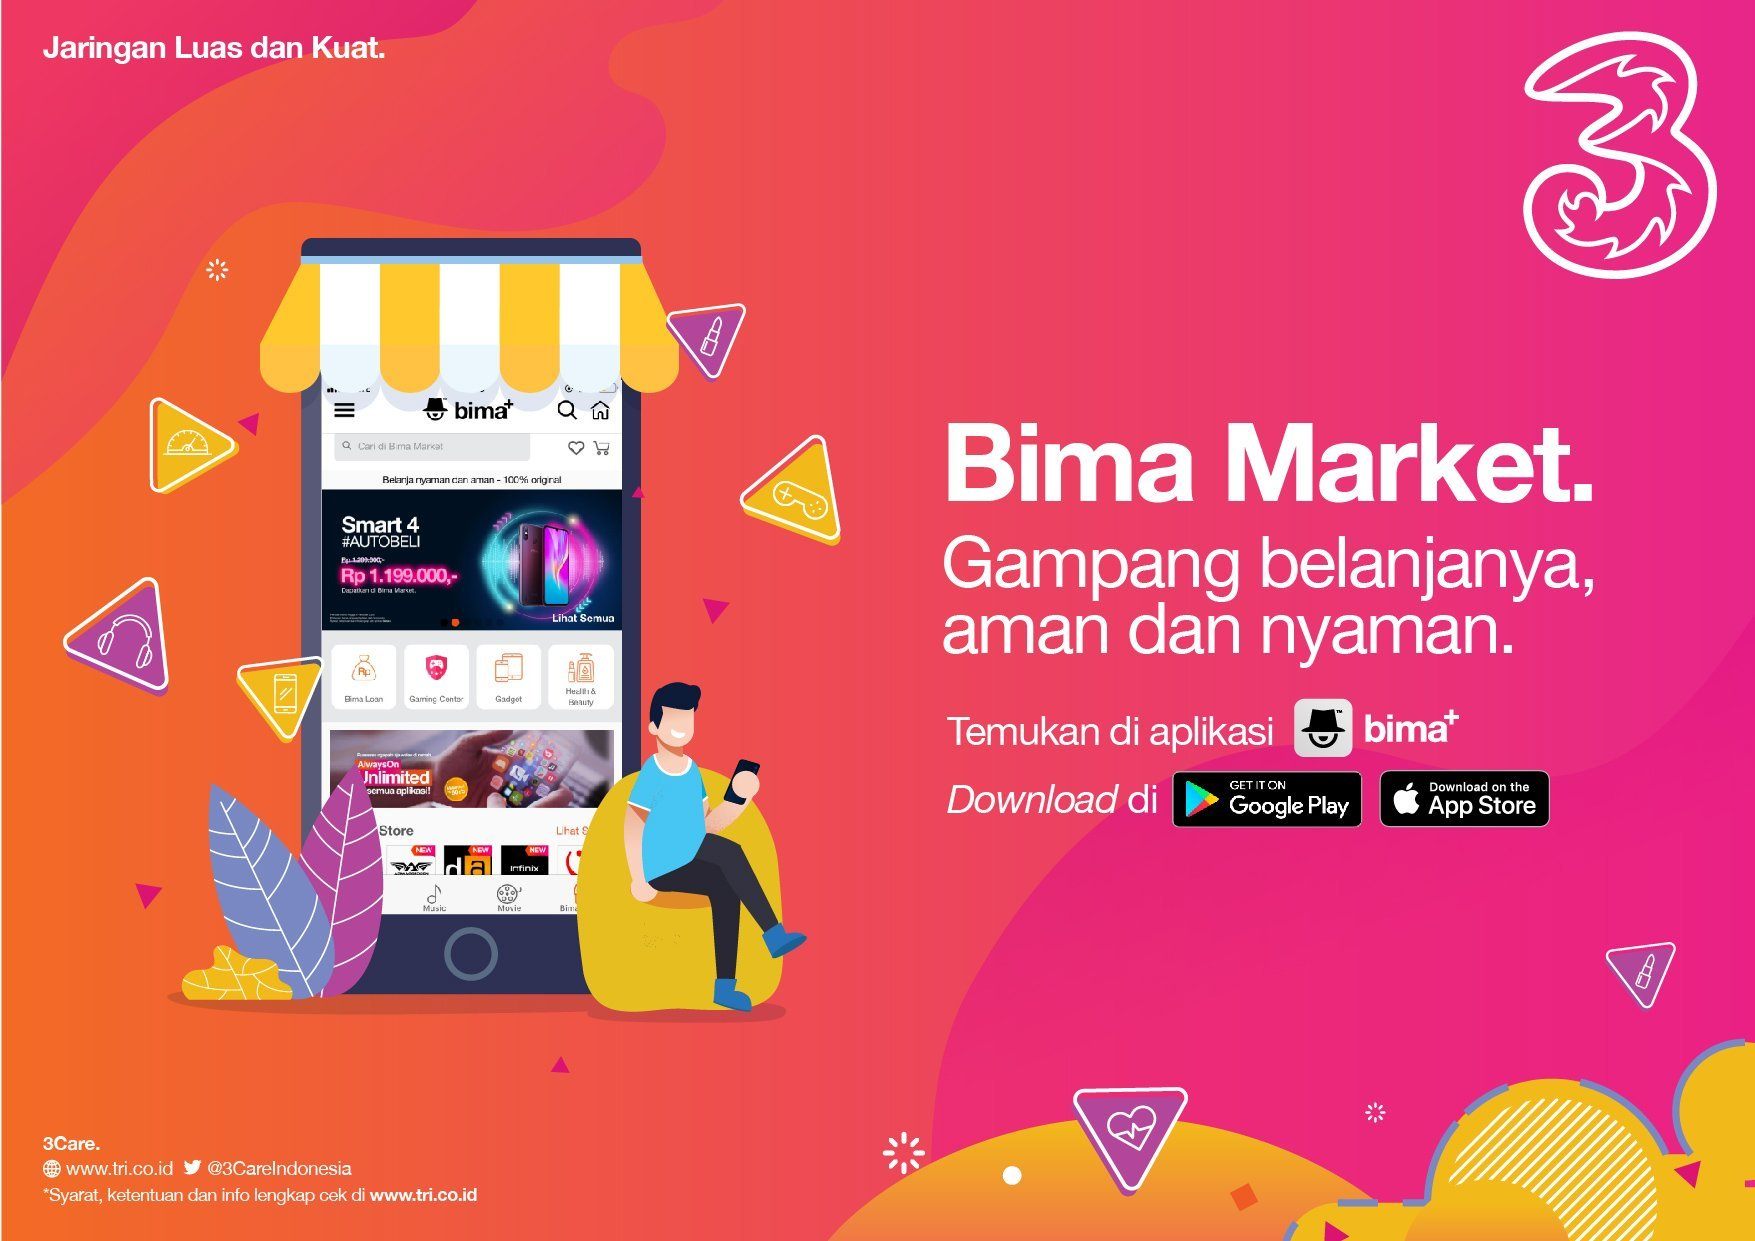 peningkatan akses bima market